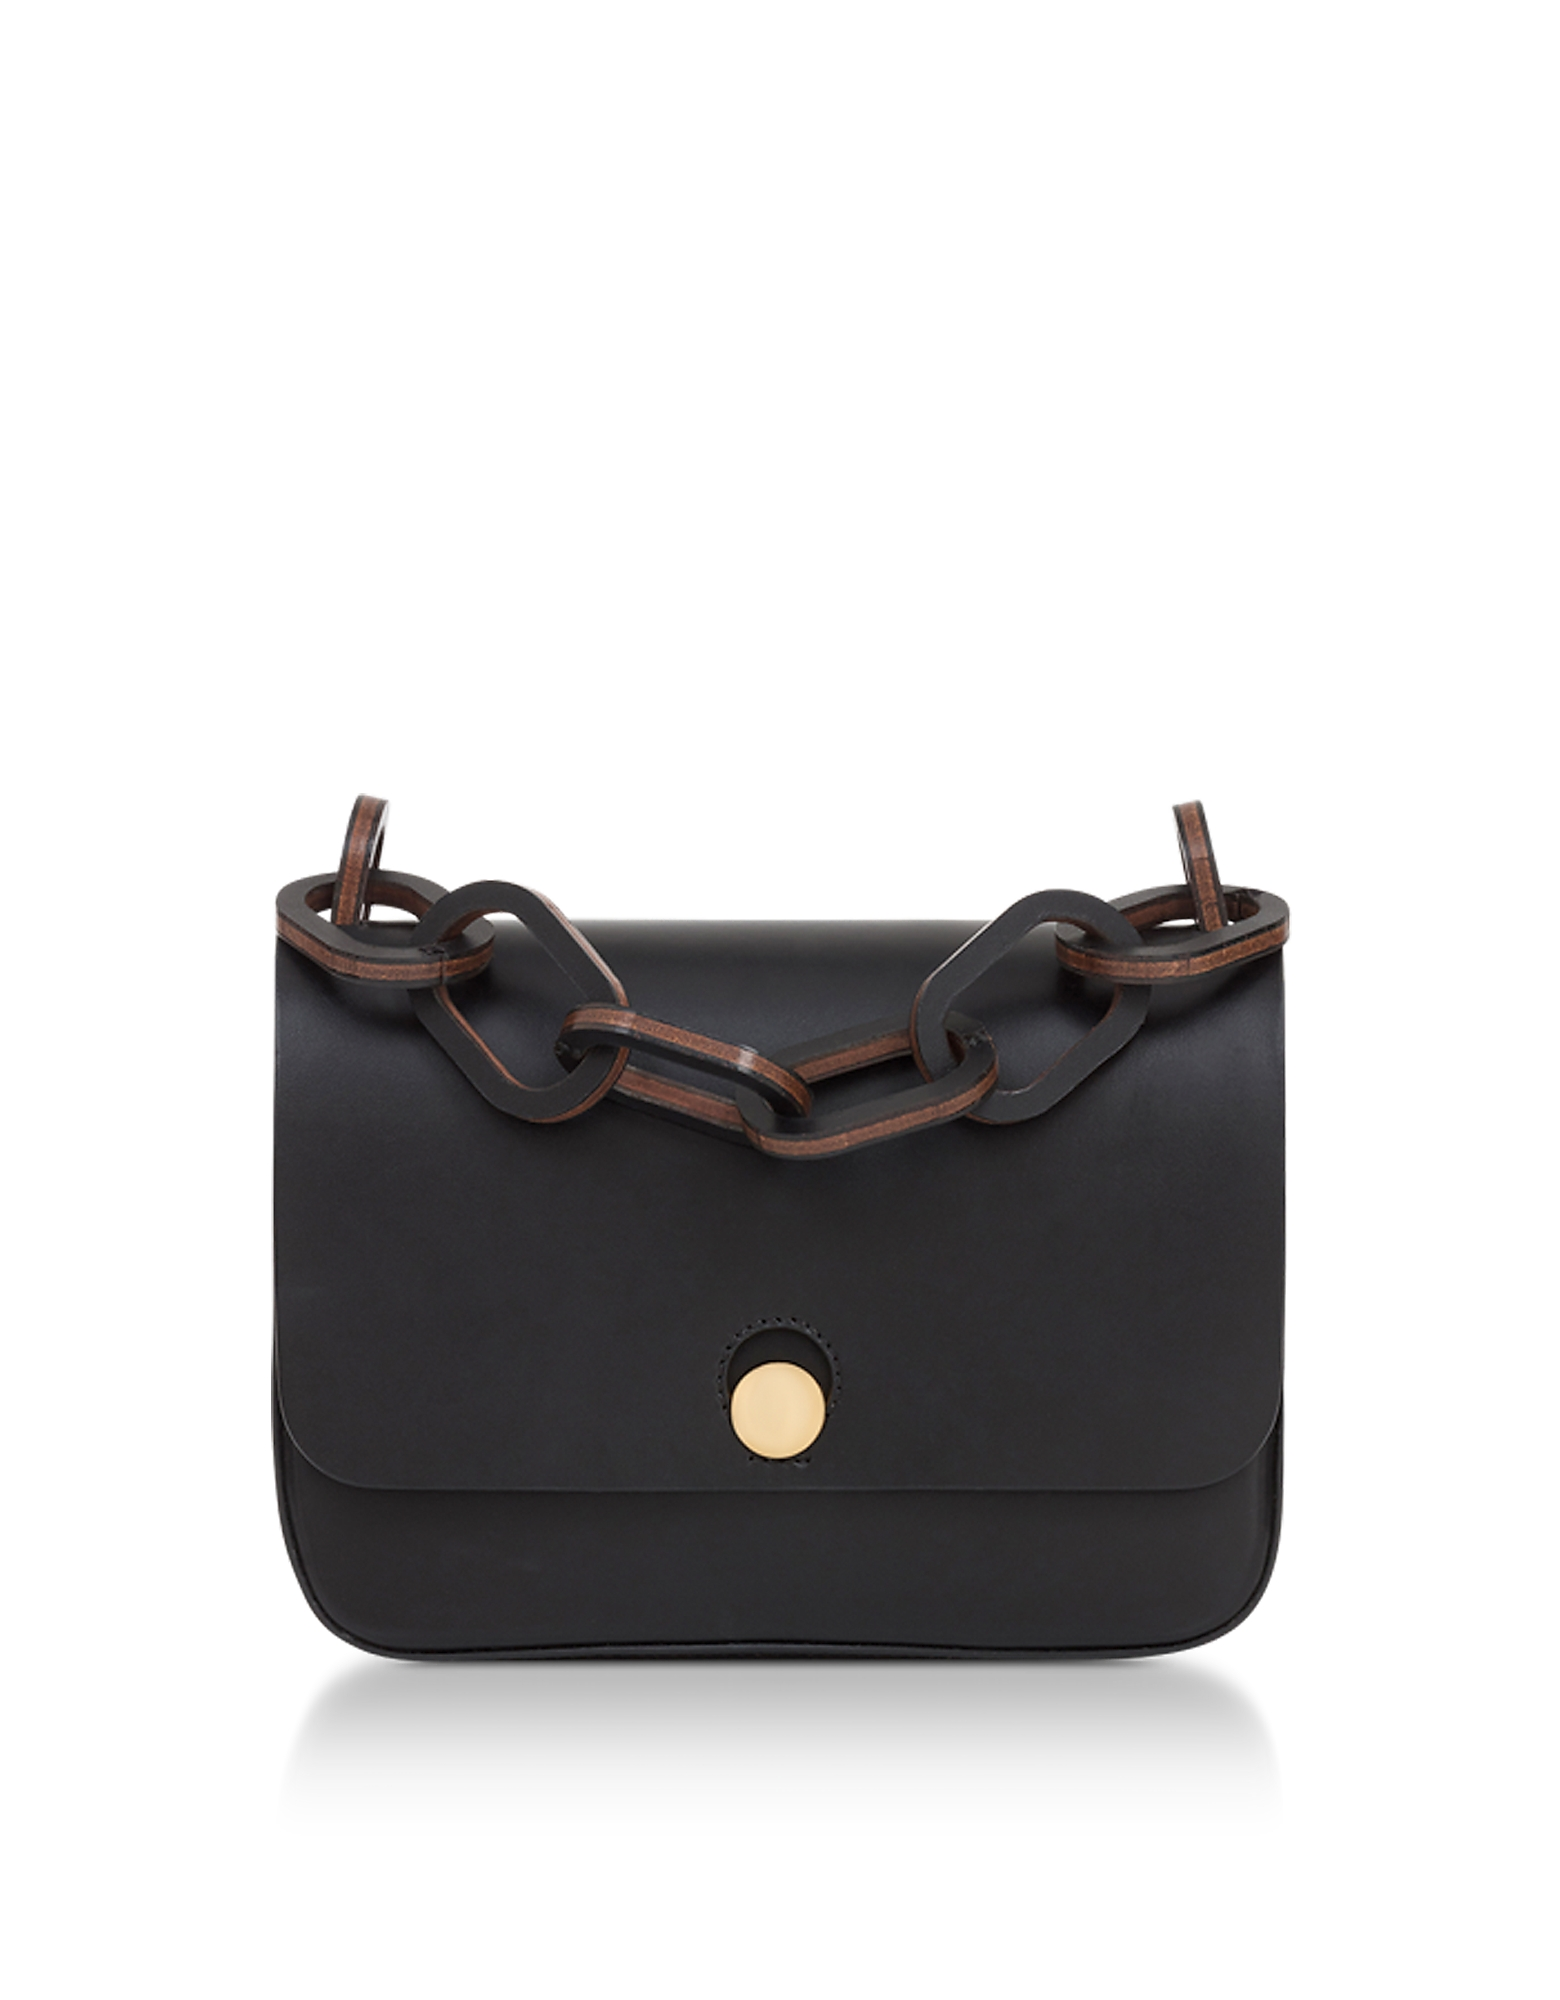 Sophie Hulme Handbags, Black Small Spring Crossbody